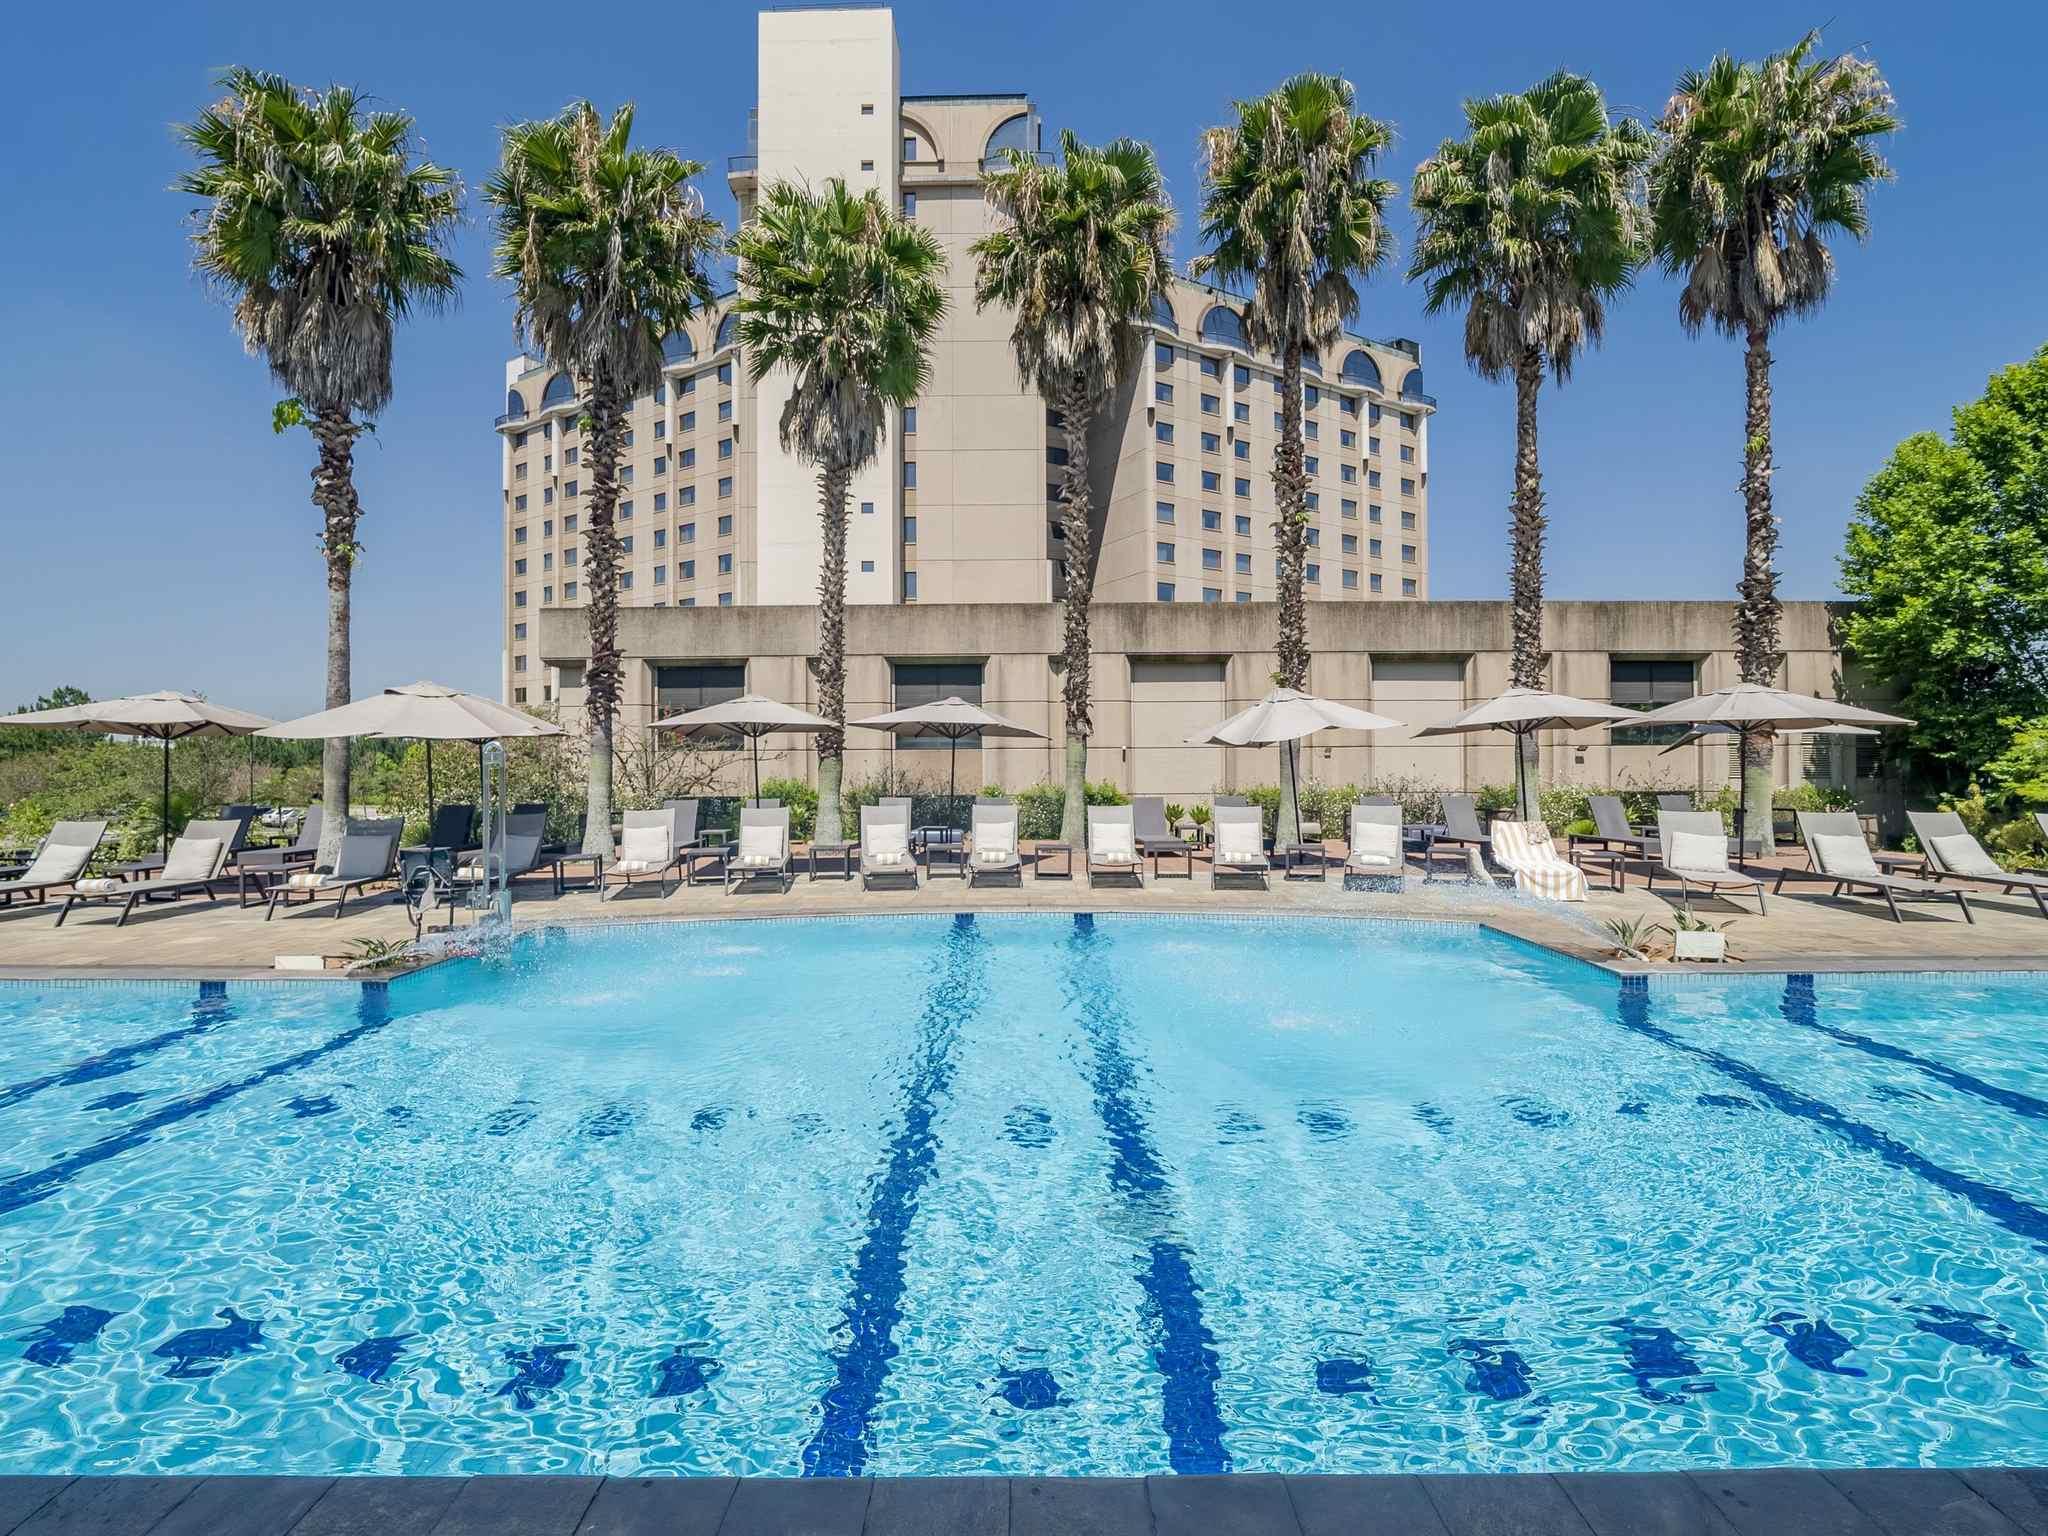 Sao Paulo Mercure Hotels